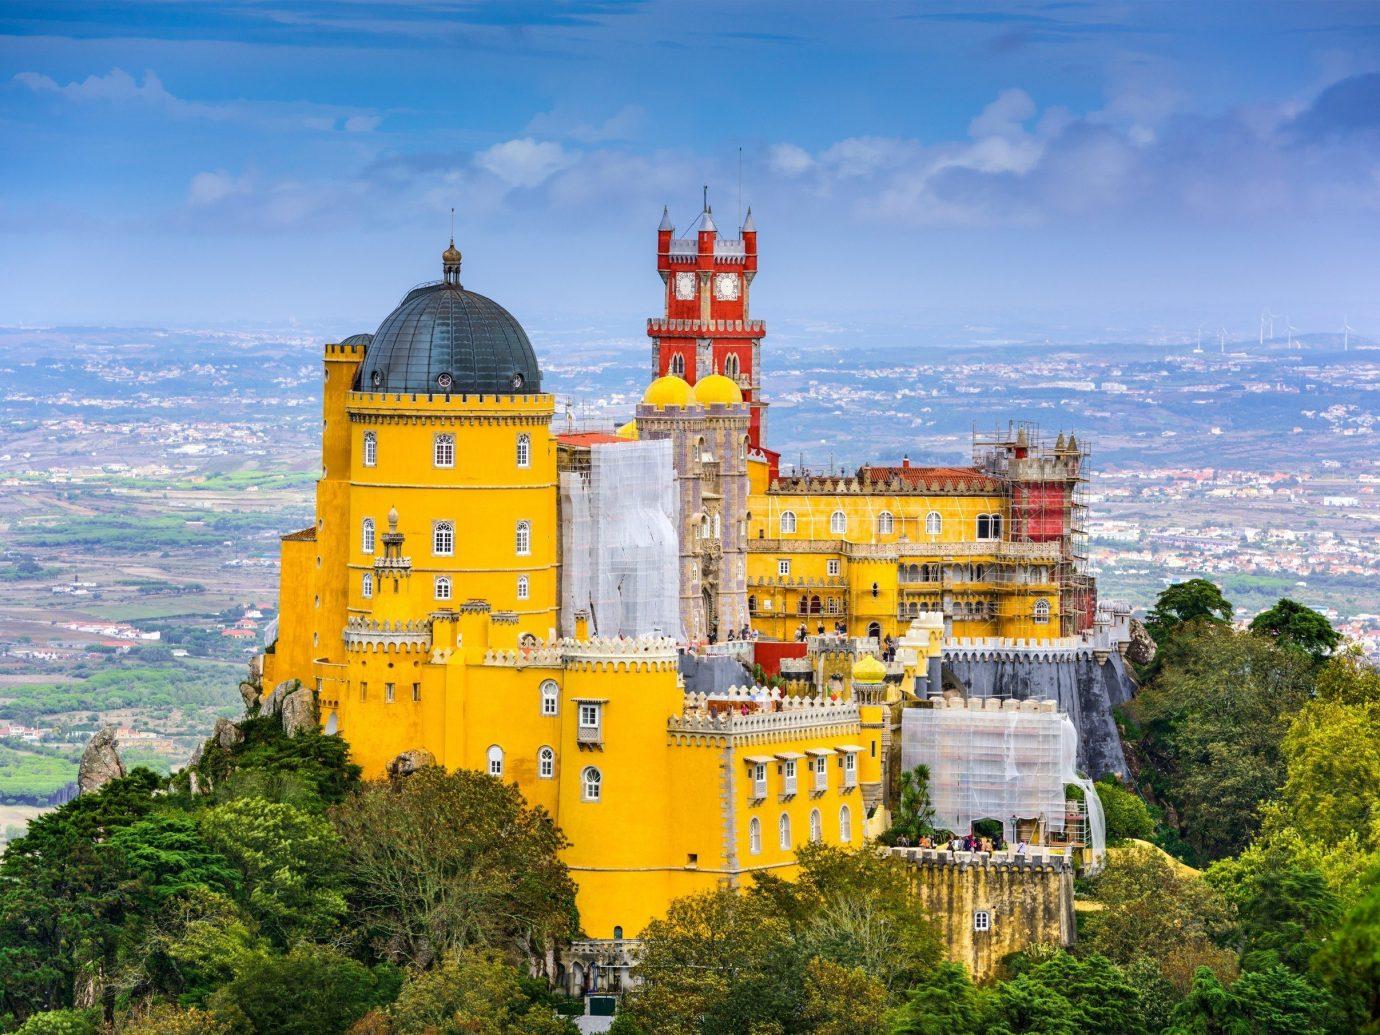 Trip Ideas tree outdoor sky yellow tower landmark Coast tourism castle Sea